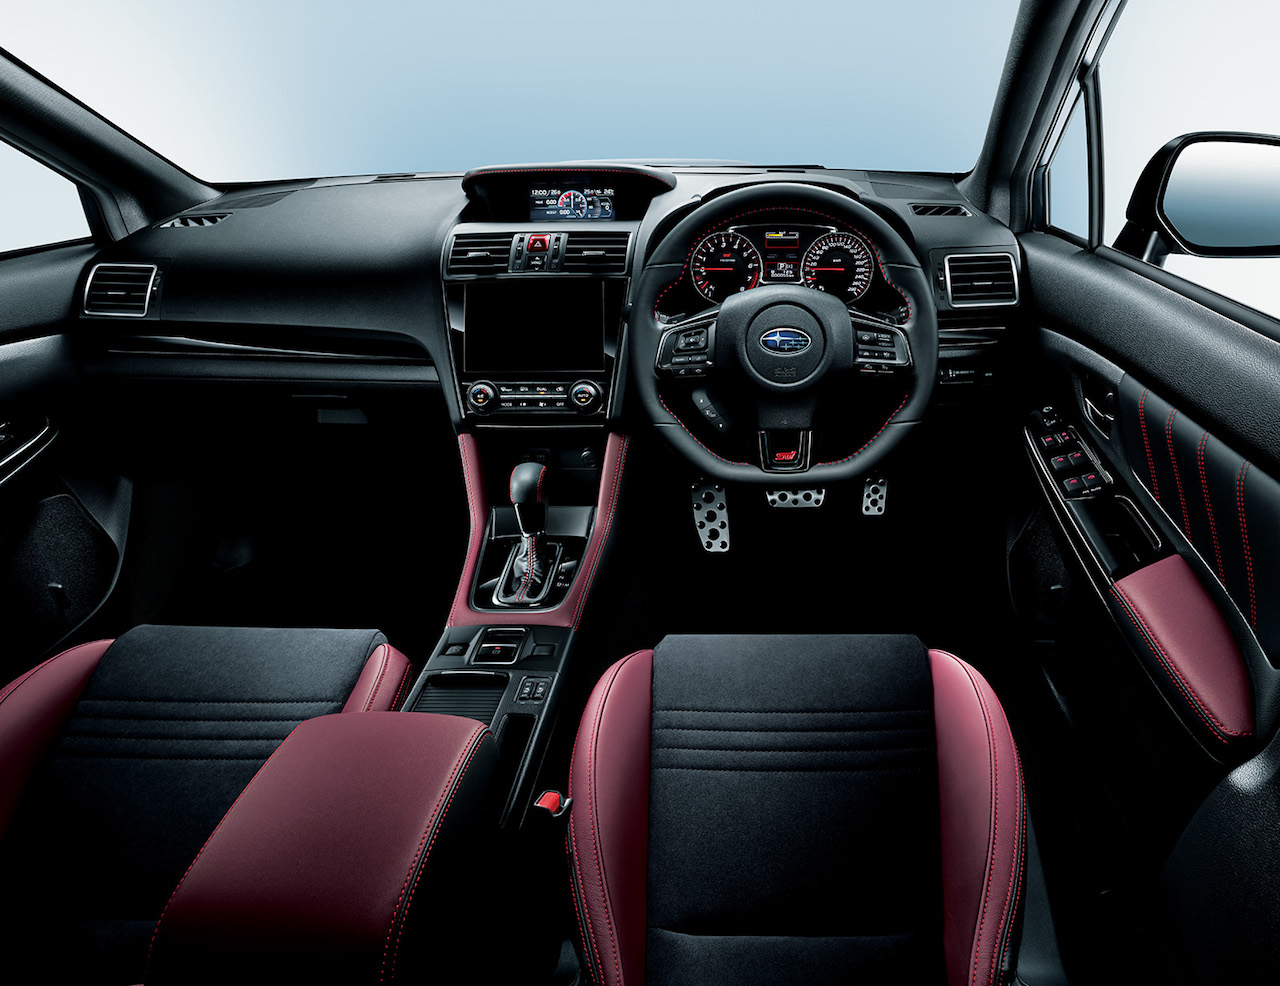 「SUBARU WRX S4が一部改良。走りと装備を強化した特別仕様車「WRX S4 STI Sport♯」を500台限定で設定【新車】」の4枚目の画像